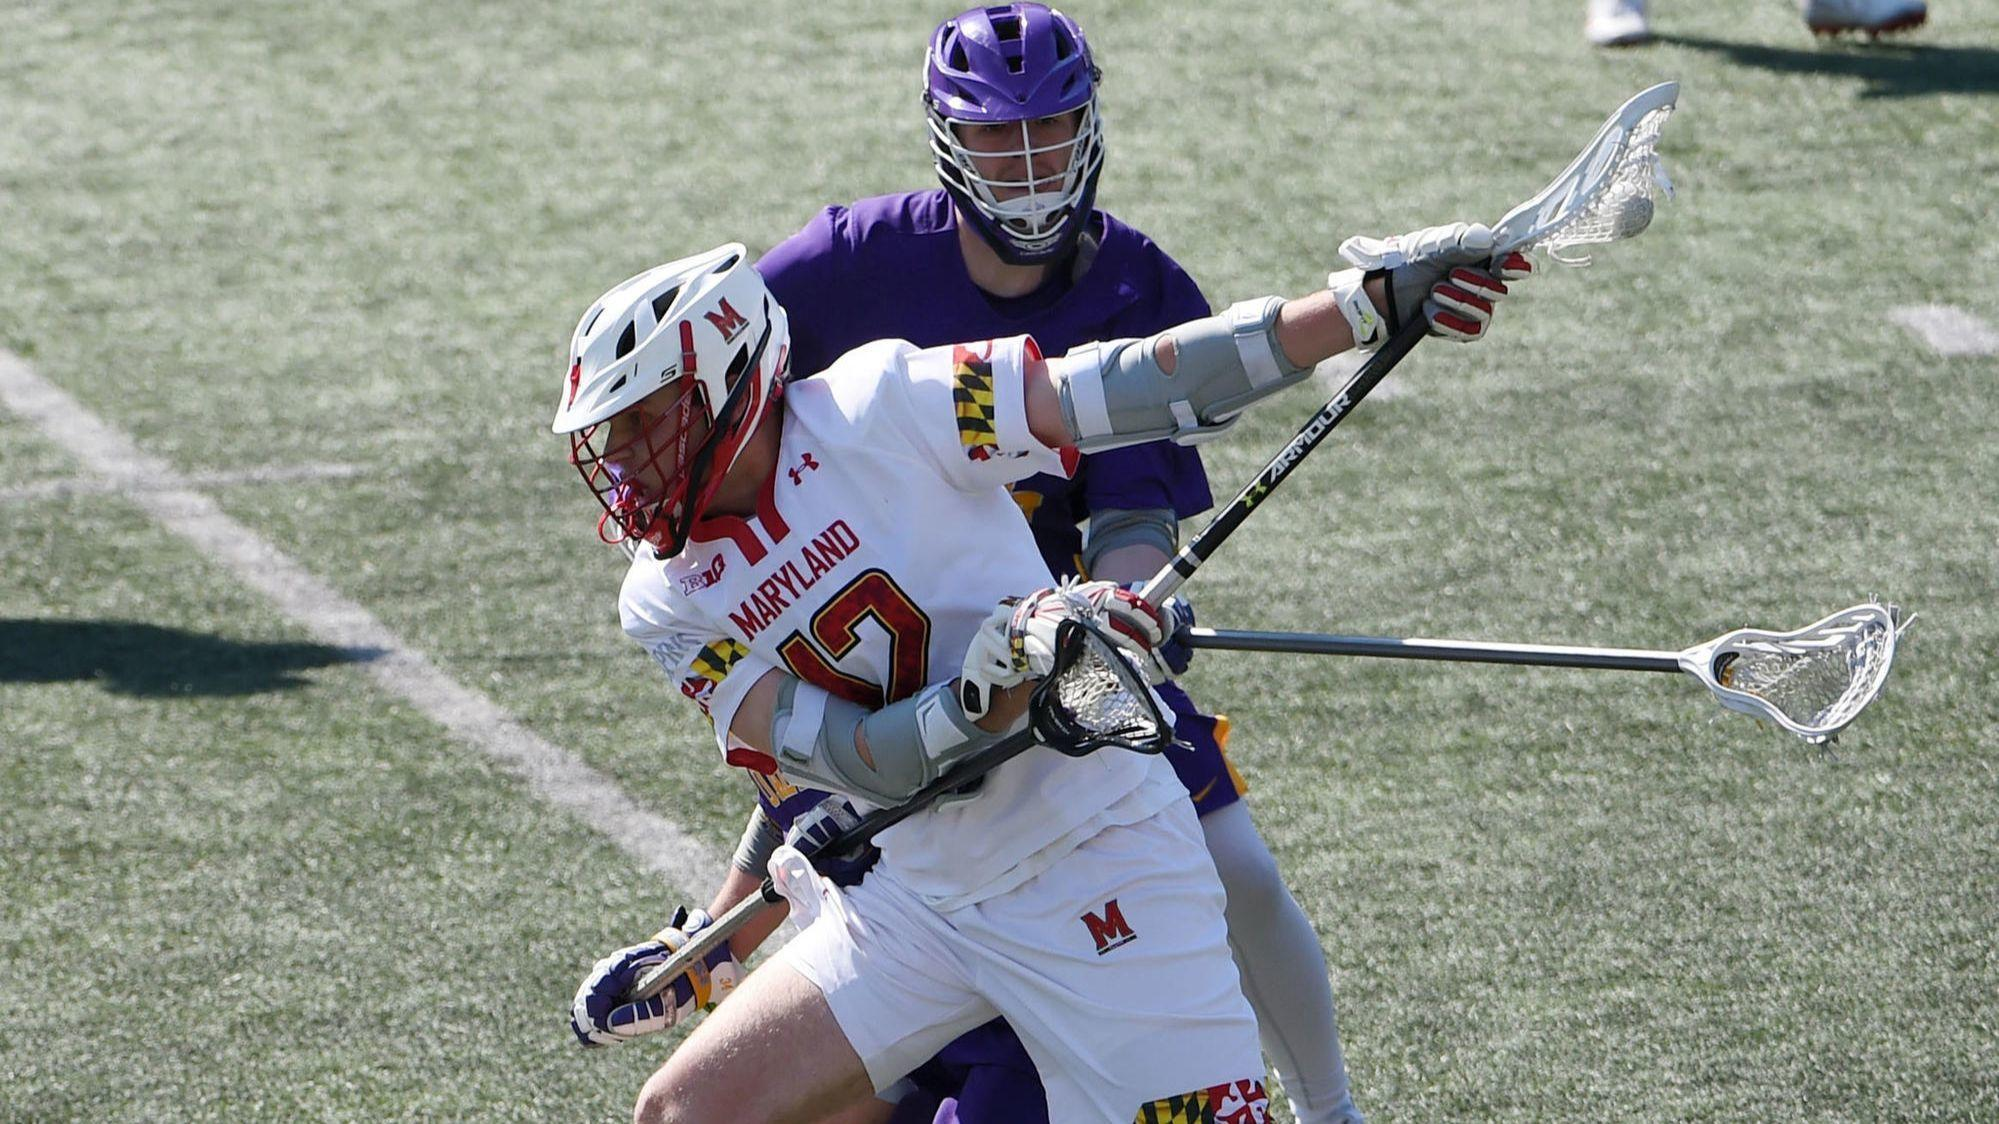 Men's lacrosse notes: Sundays filling up for Maryland ...